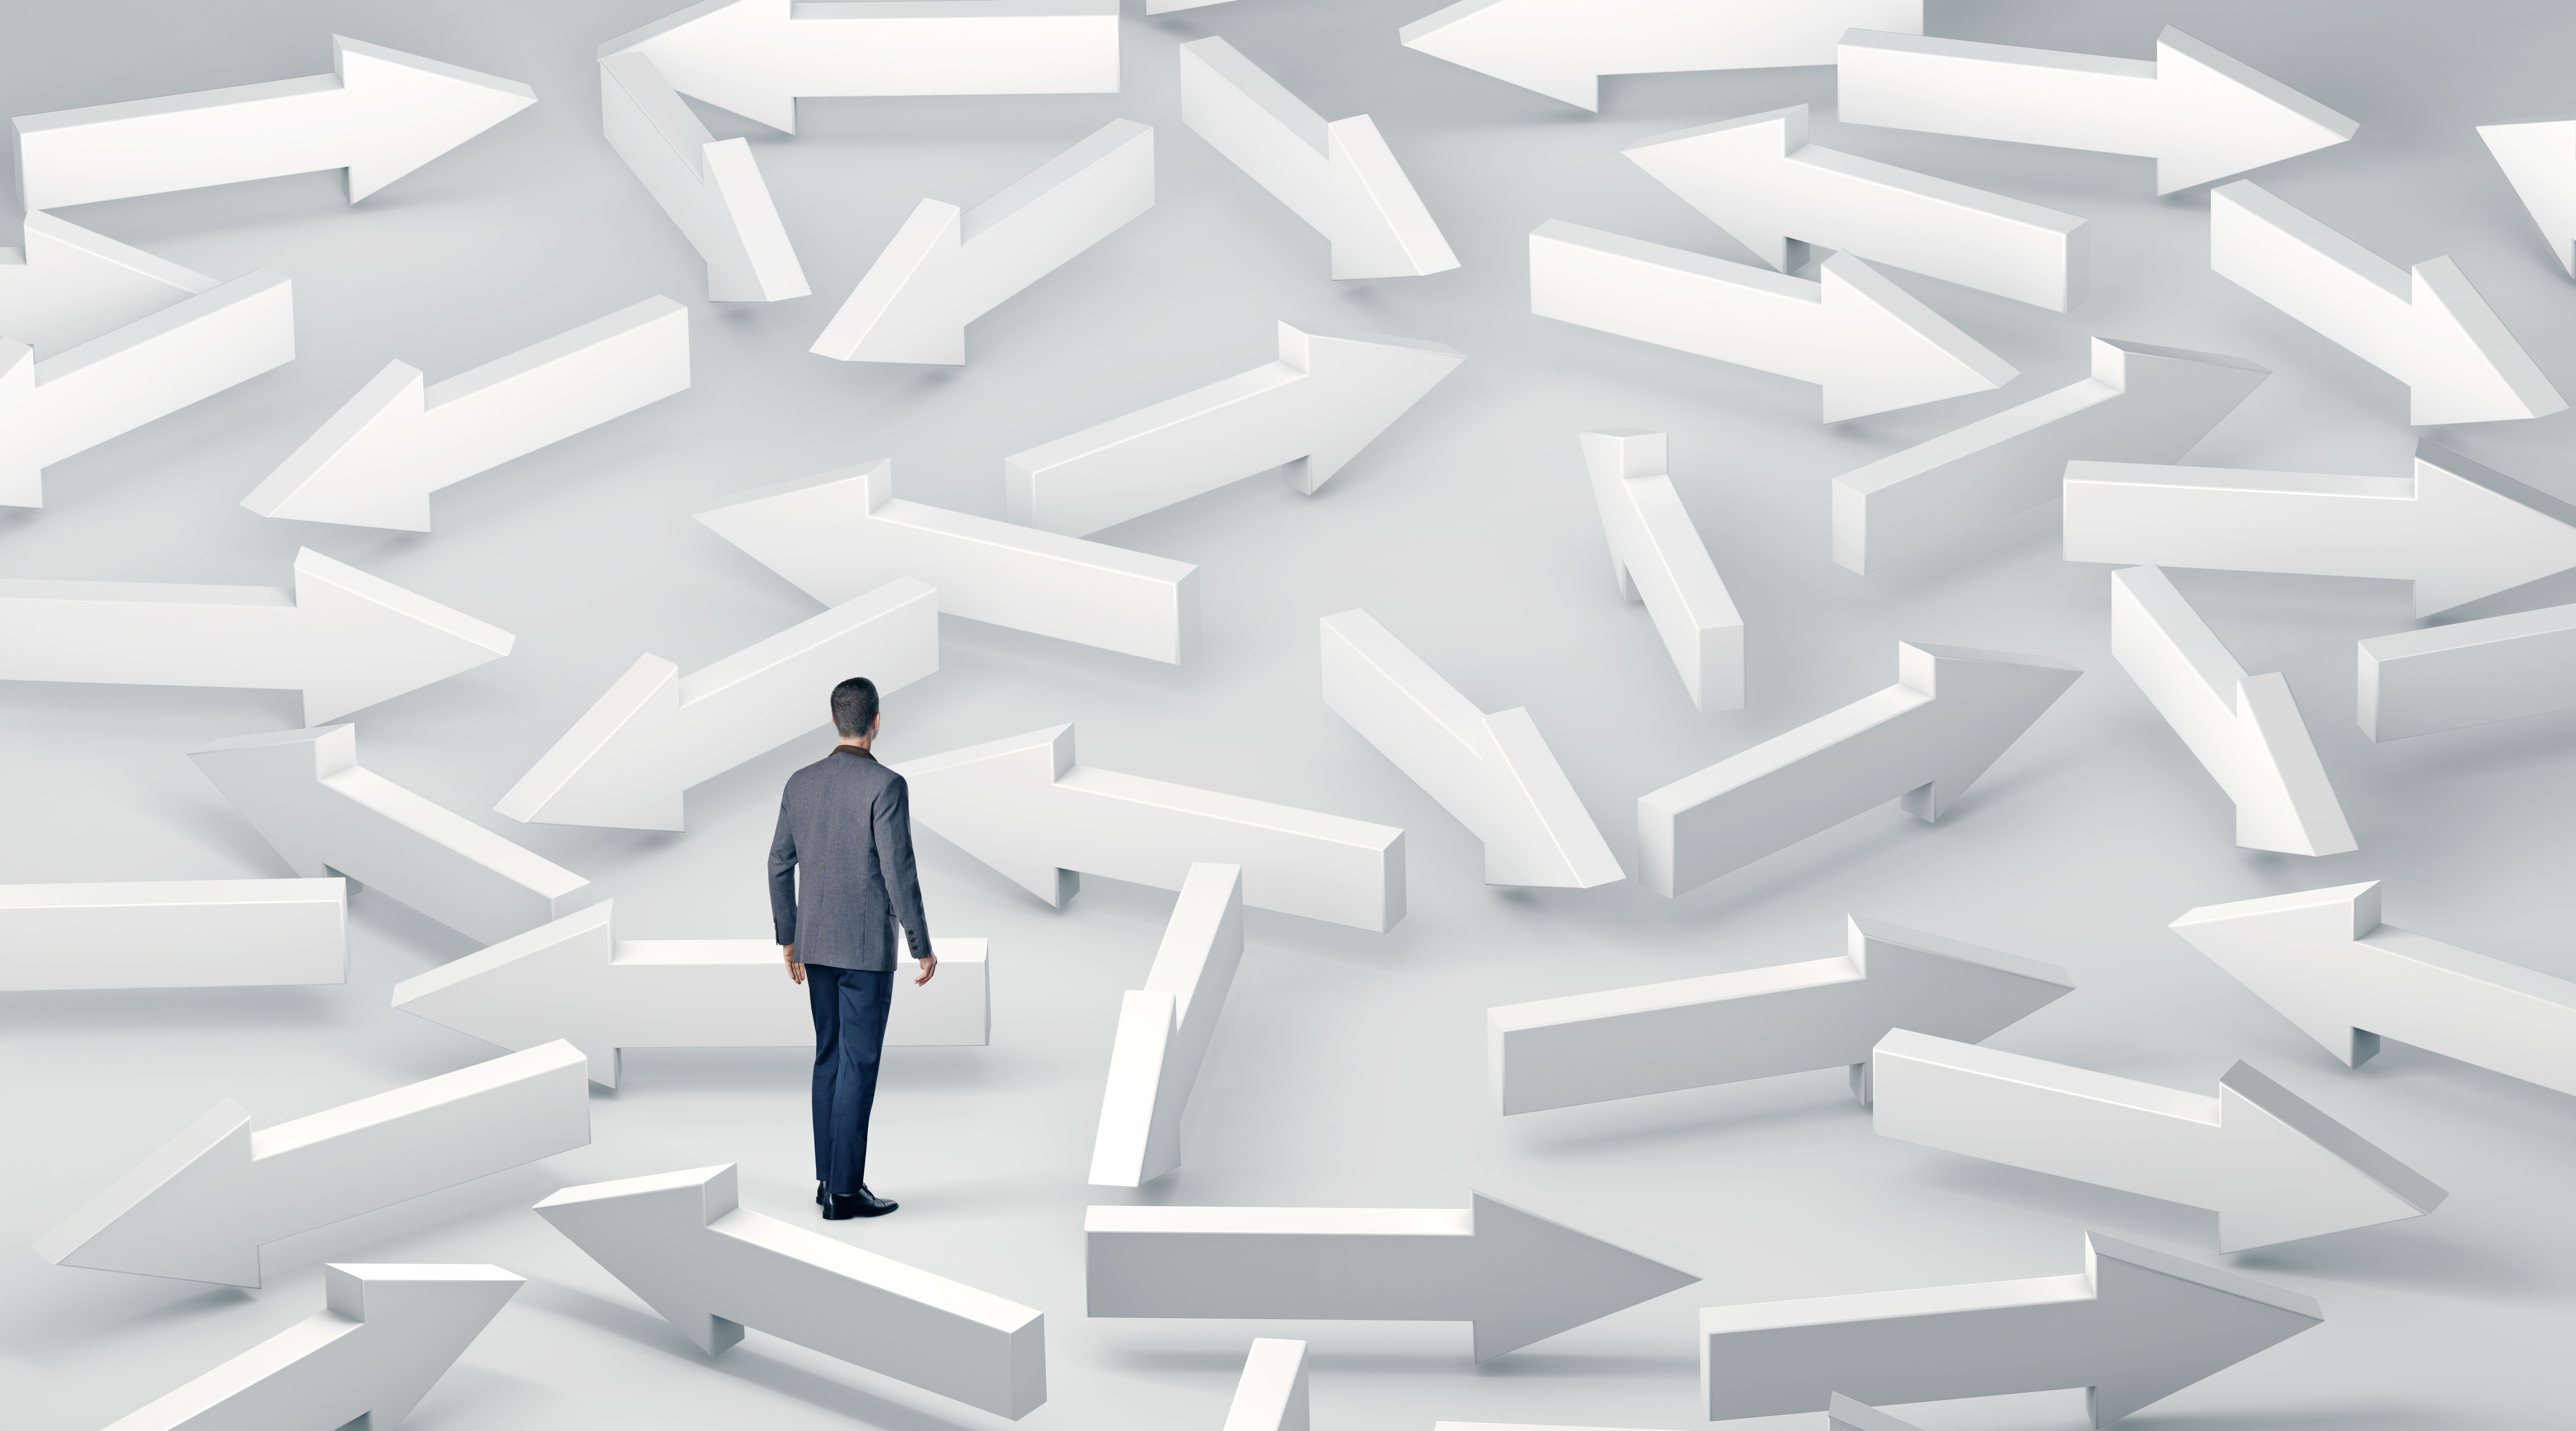 Different Problems, Different Technologies Ann post